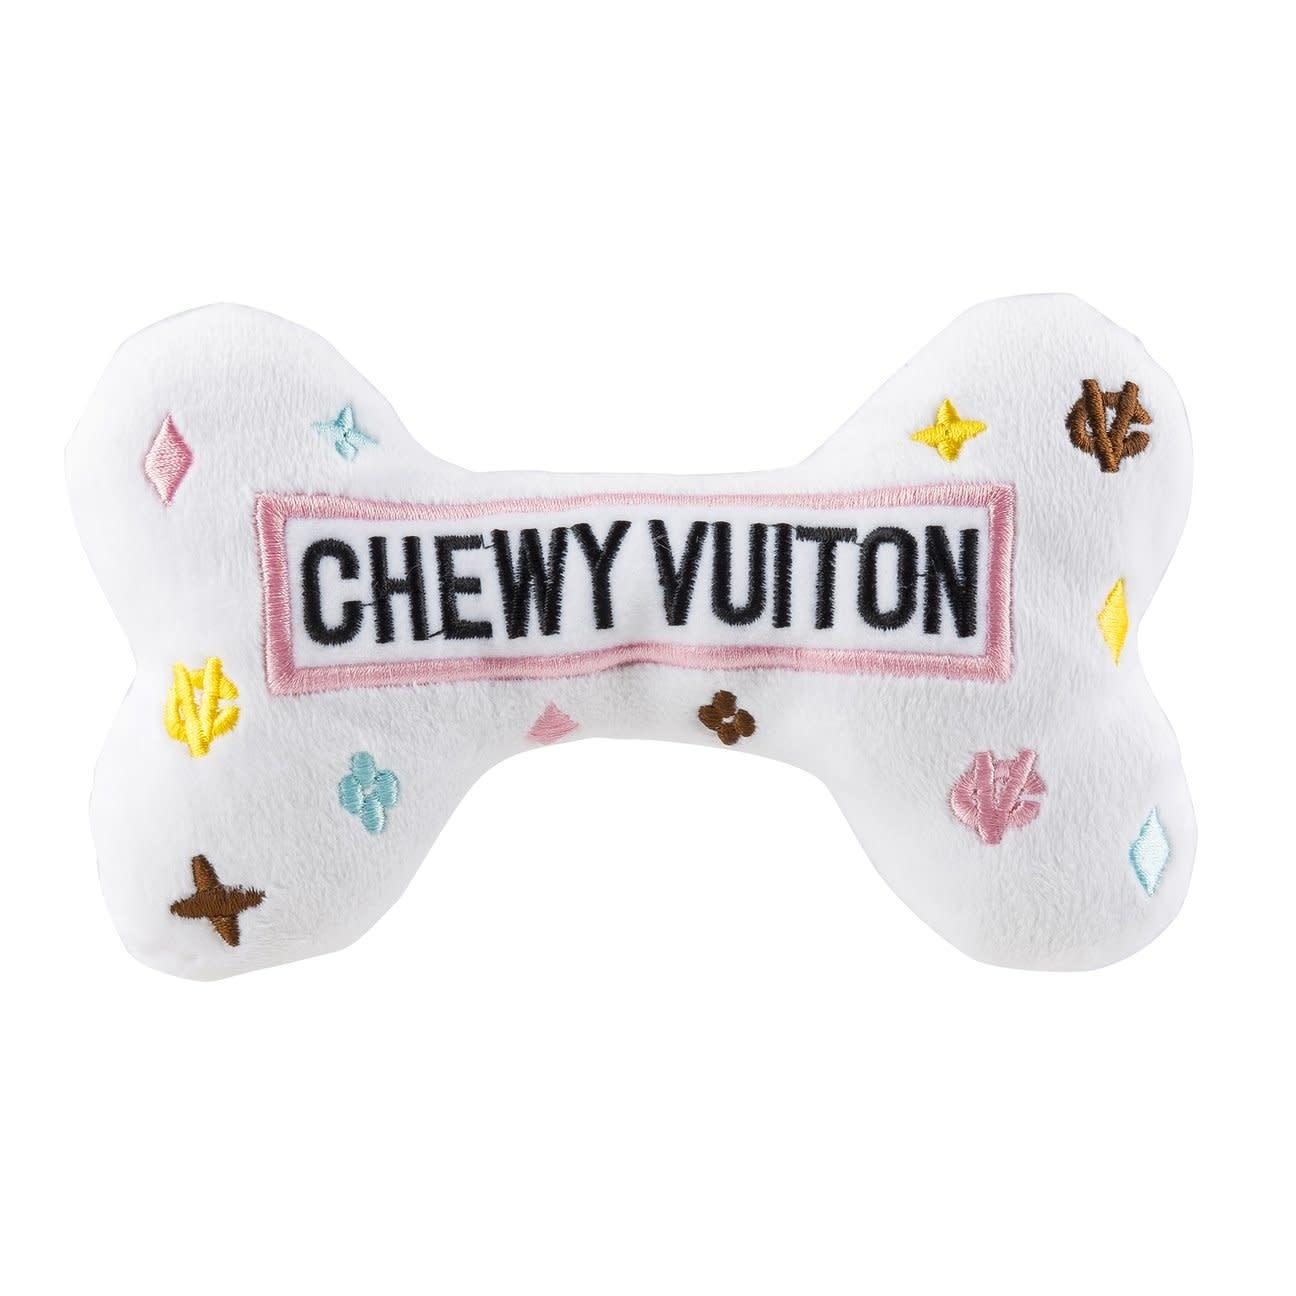 Chewy Vuiton Bone White LG